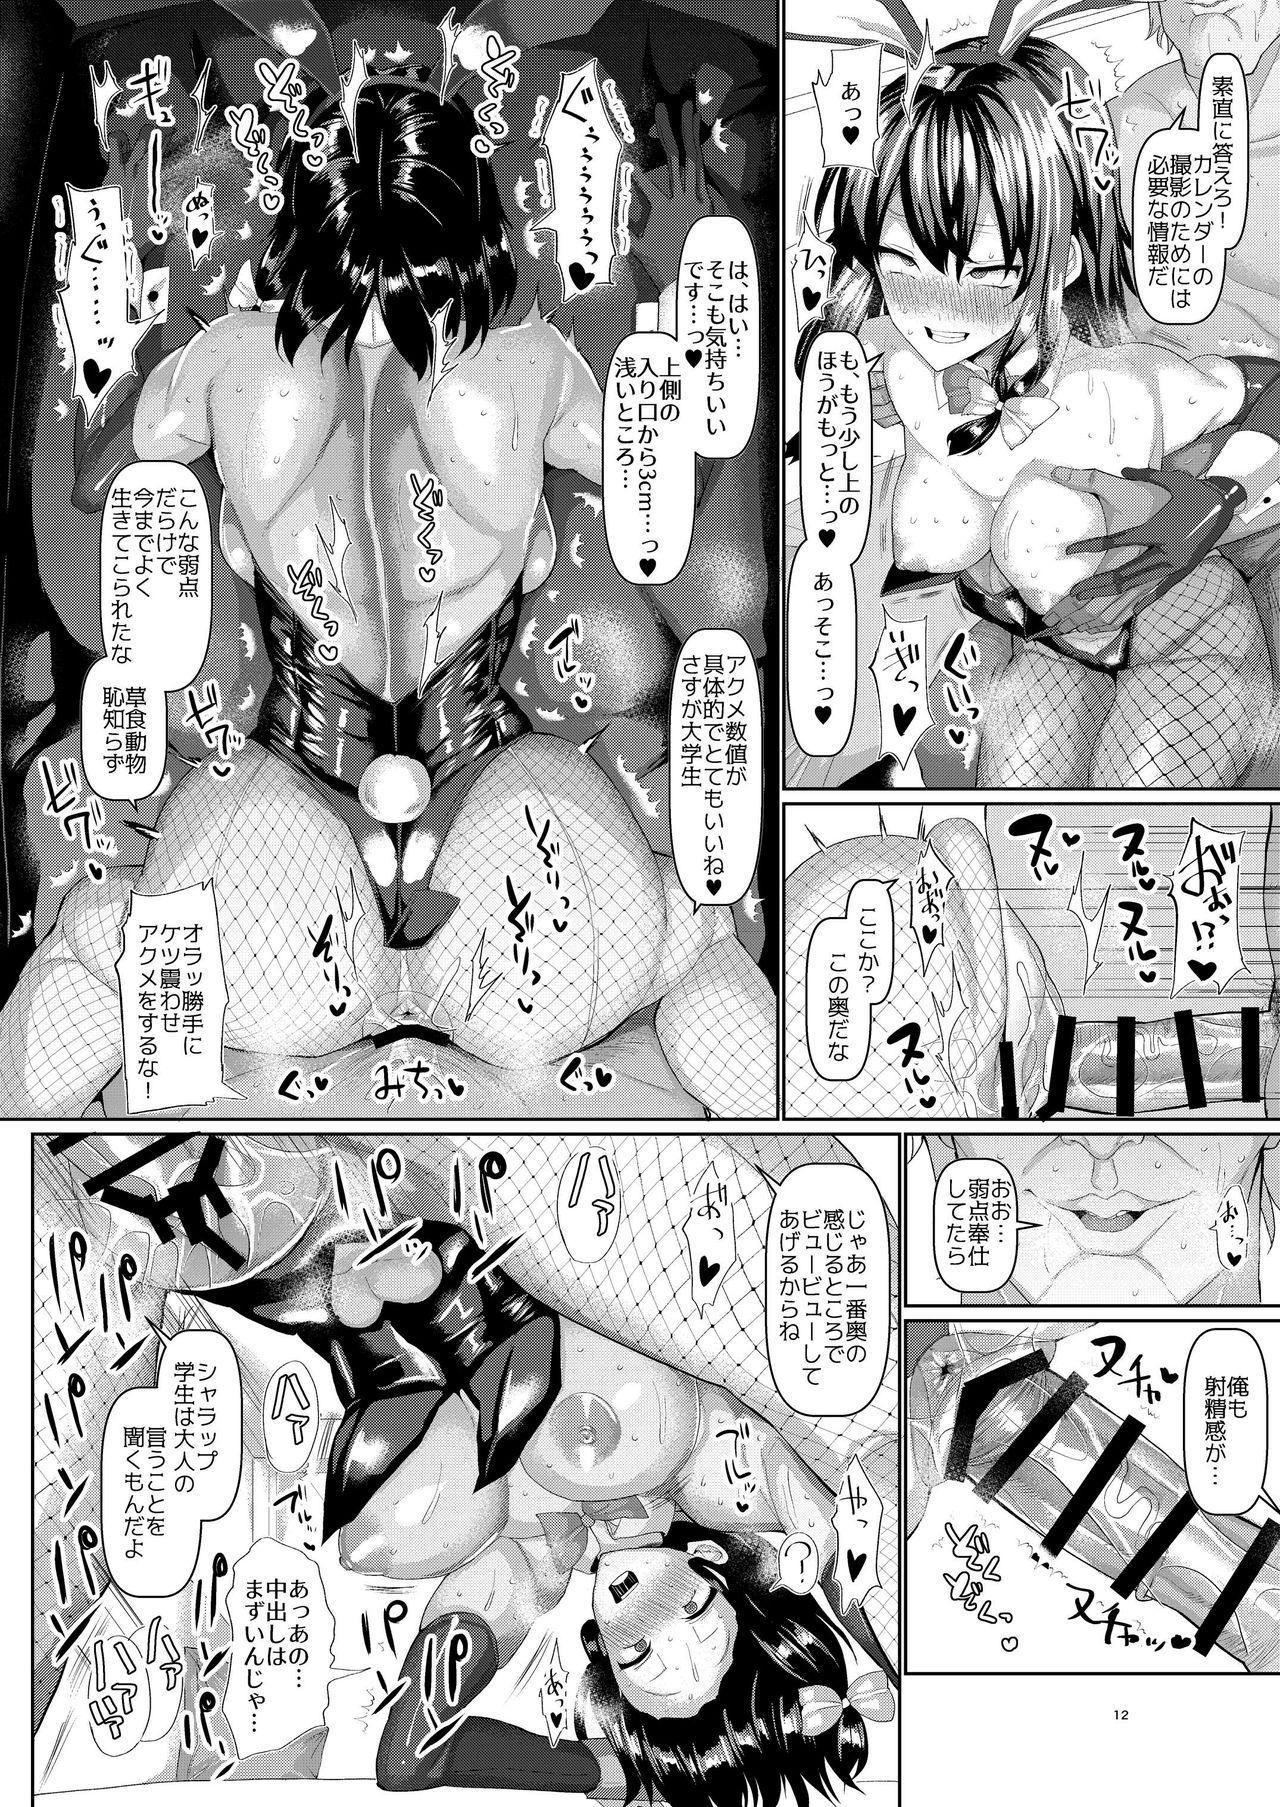 Renko Sennyuu! Saimin Bunny Girl 13